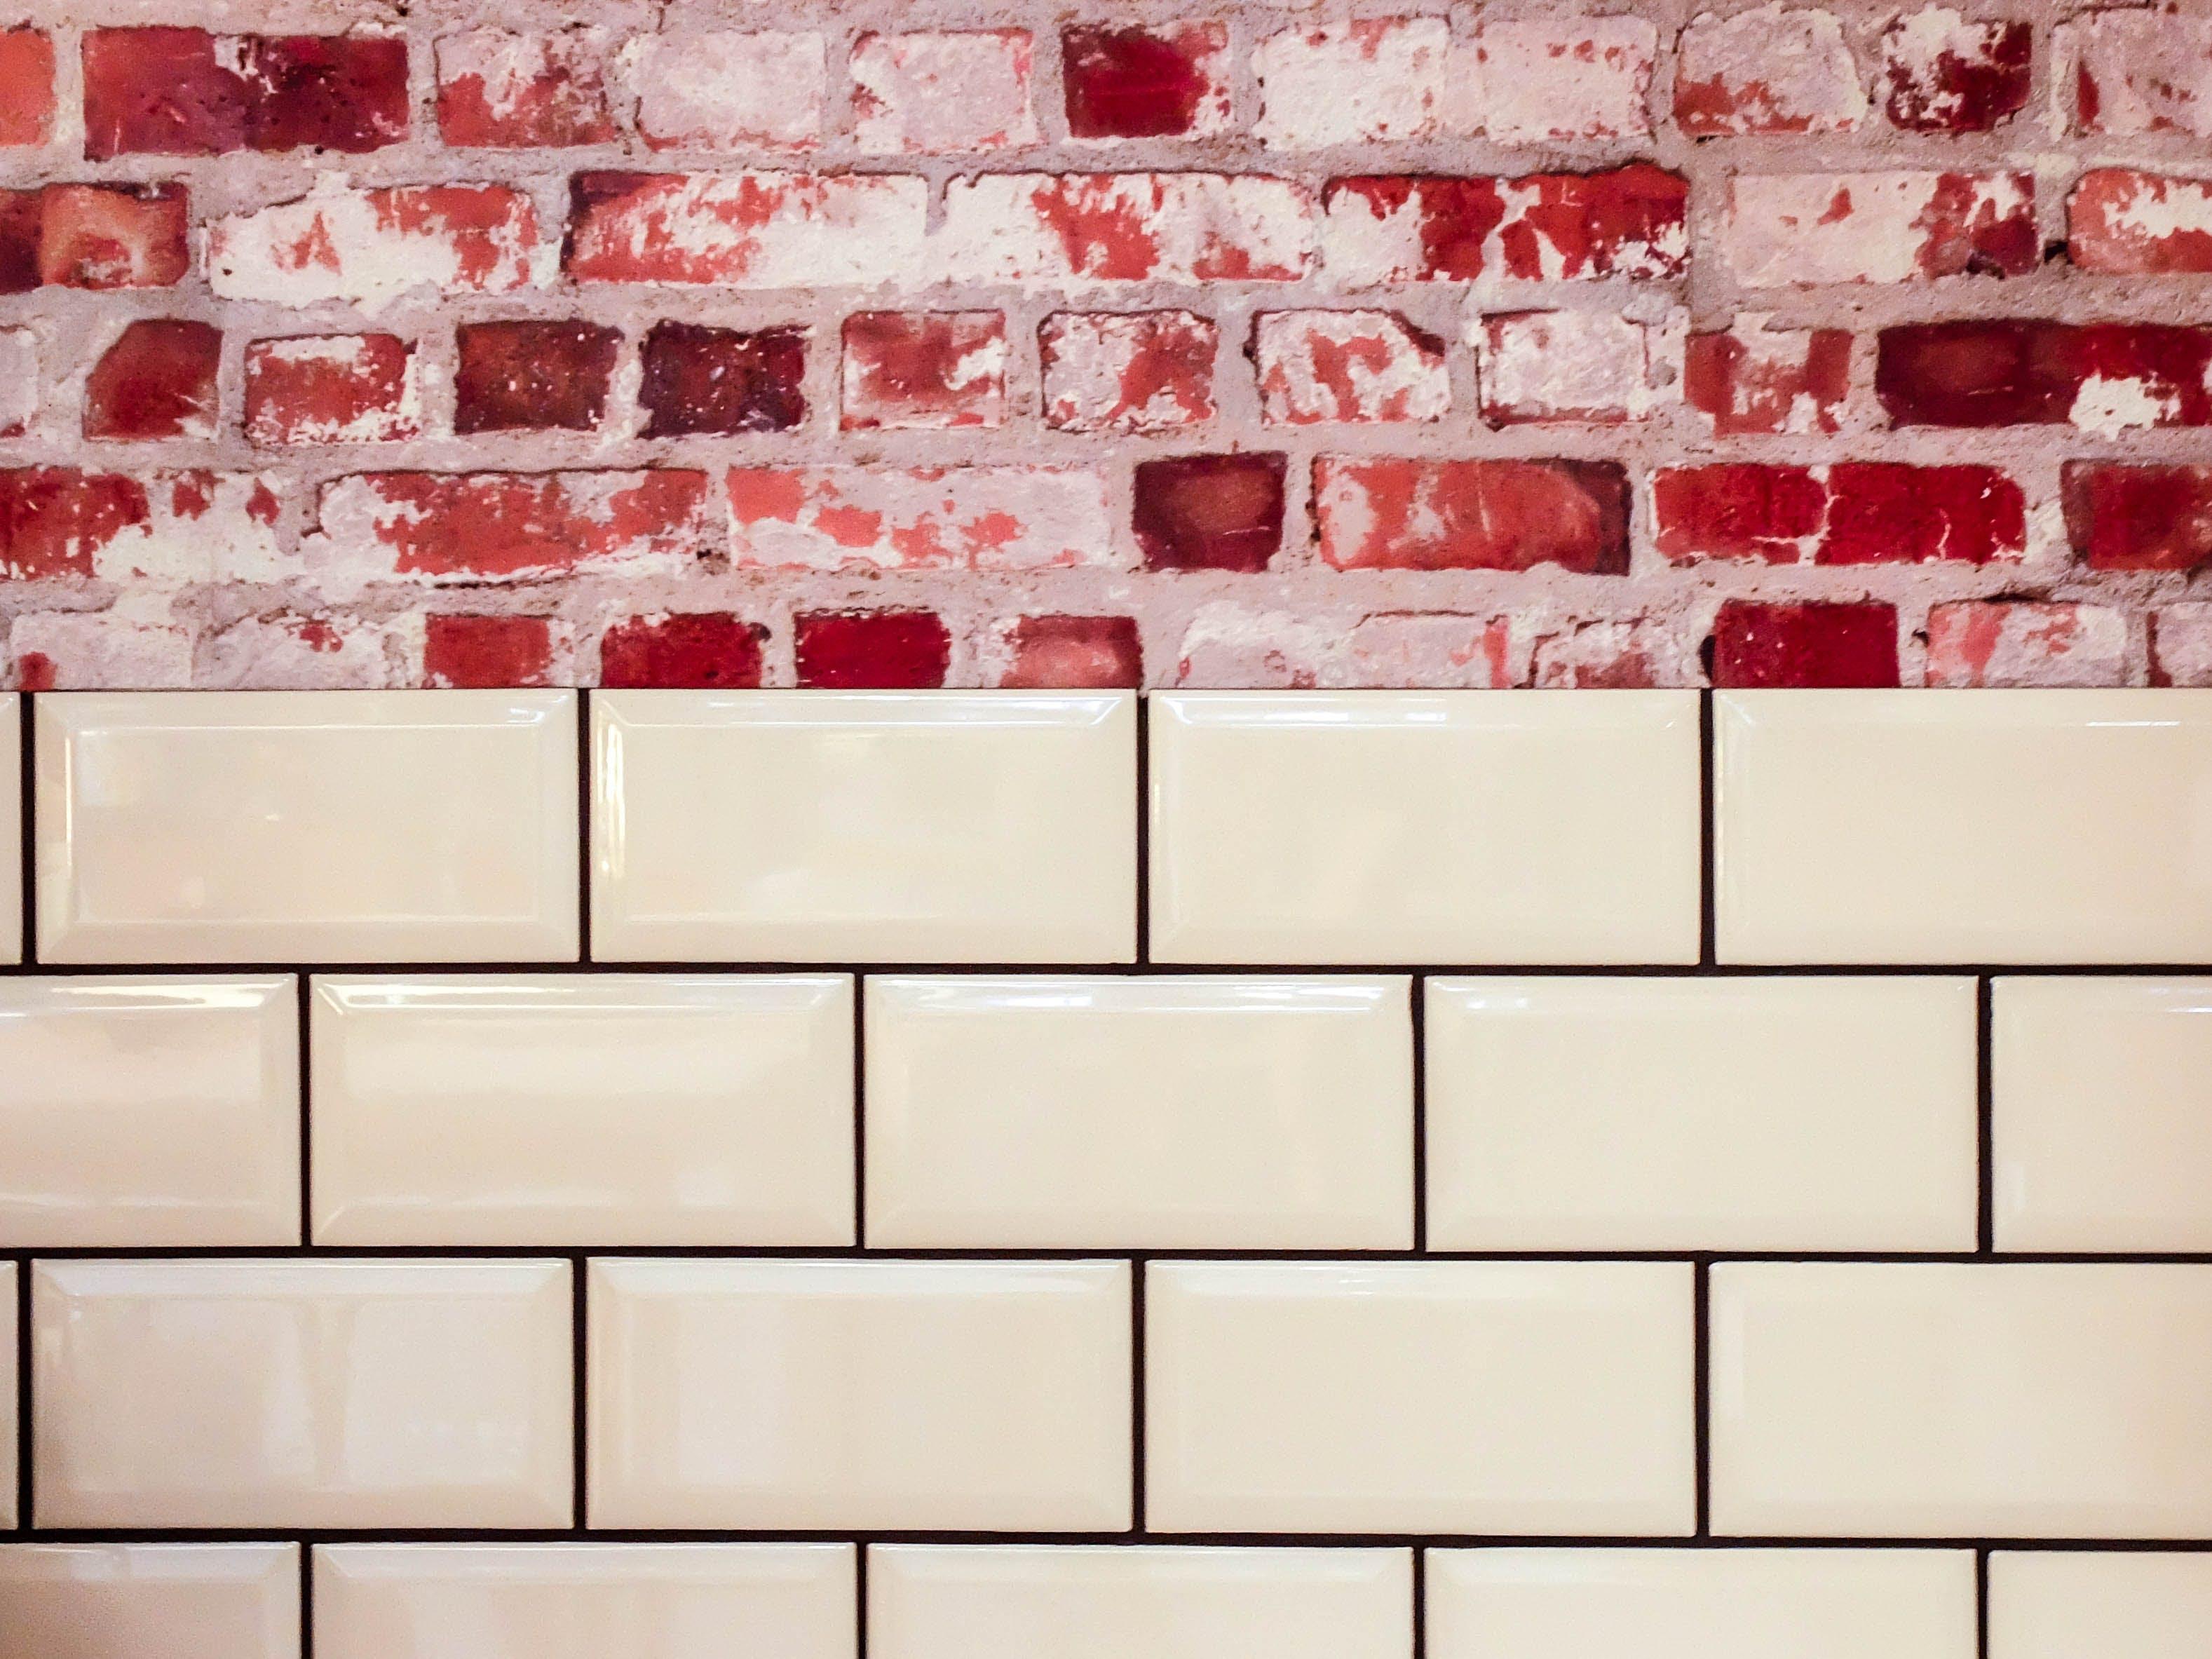 White Ceramic Wall Tile Beside Red Concrete Bricks